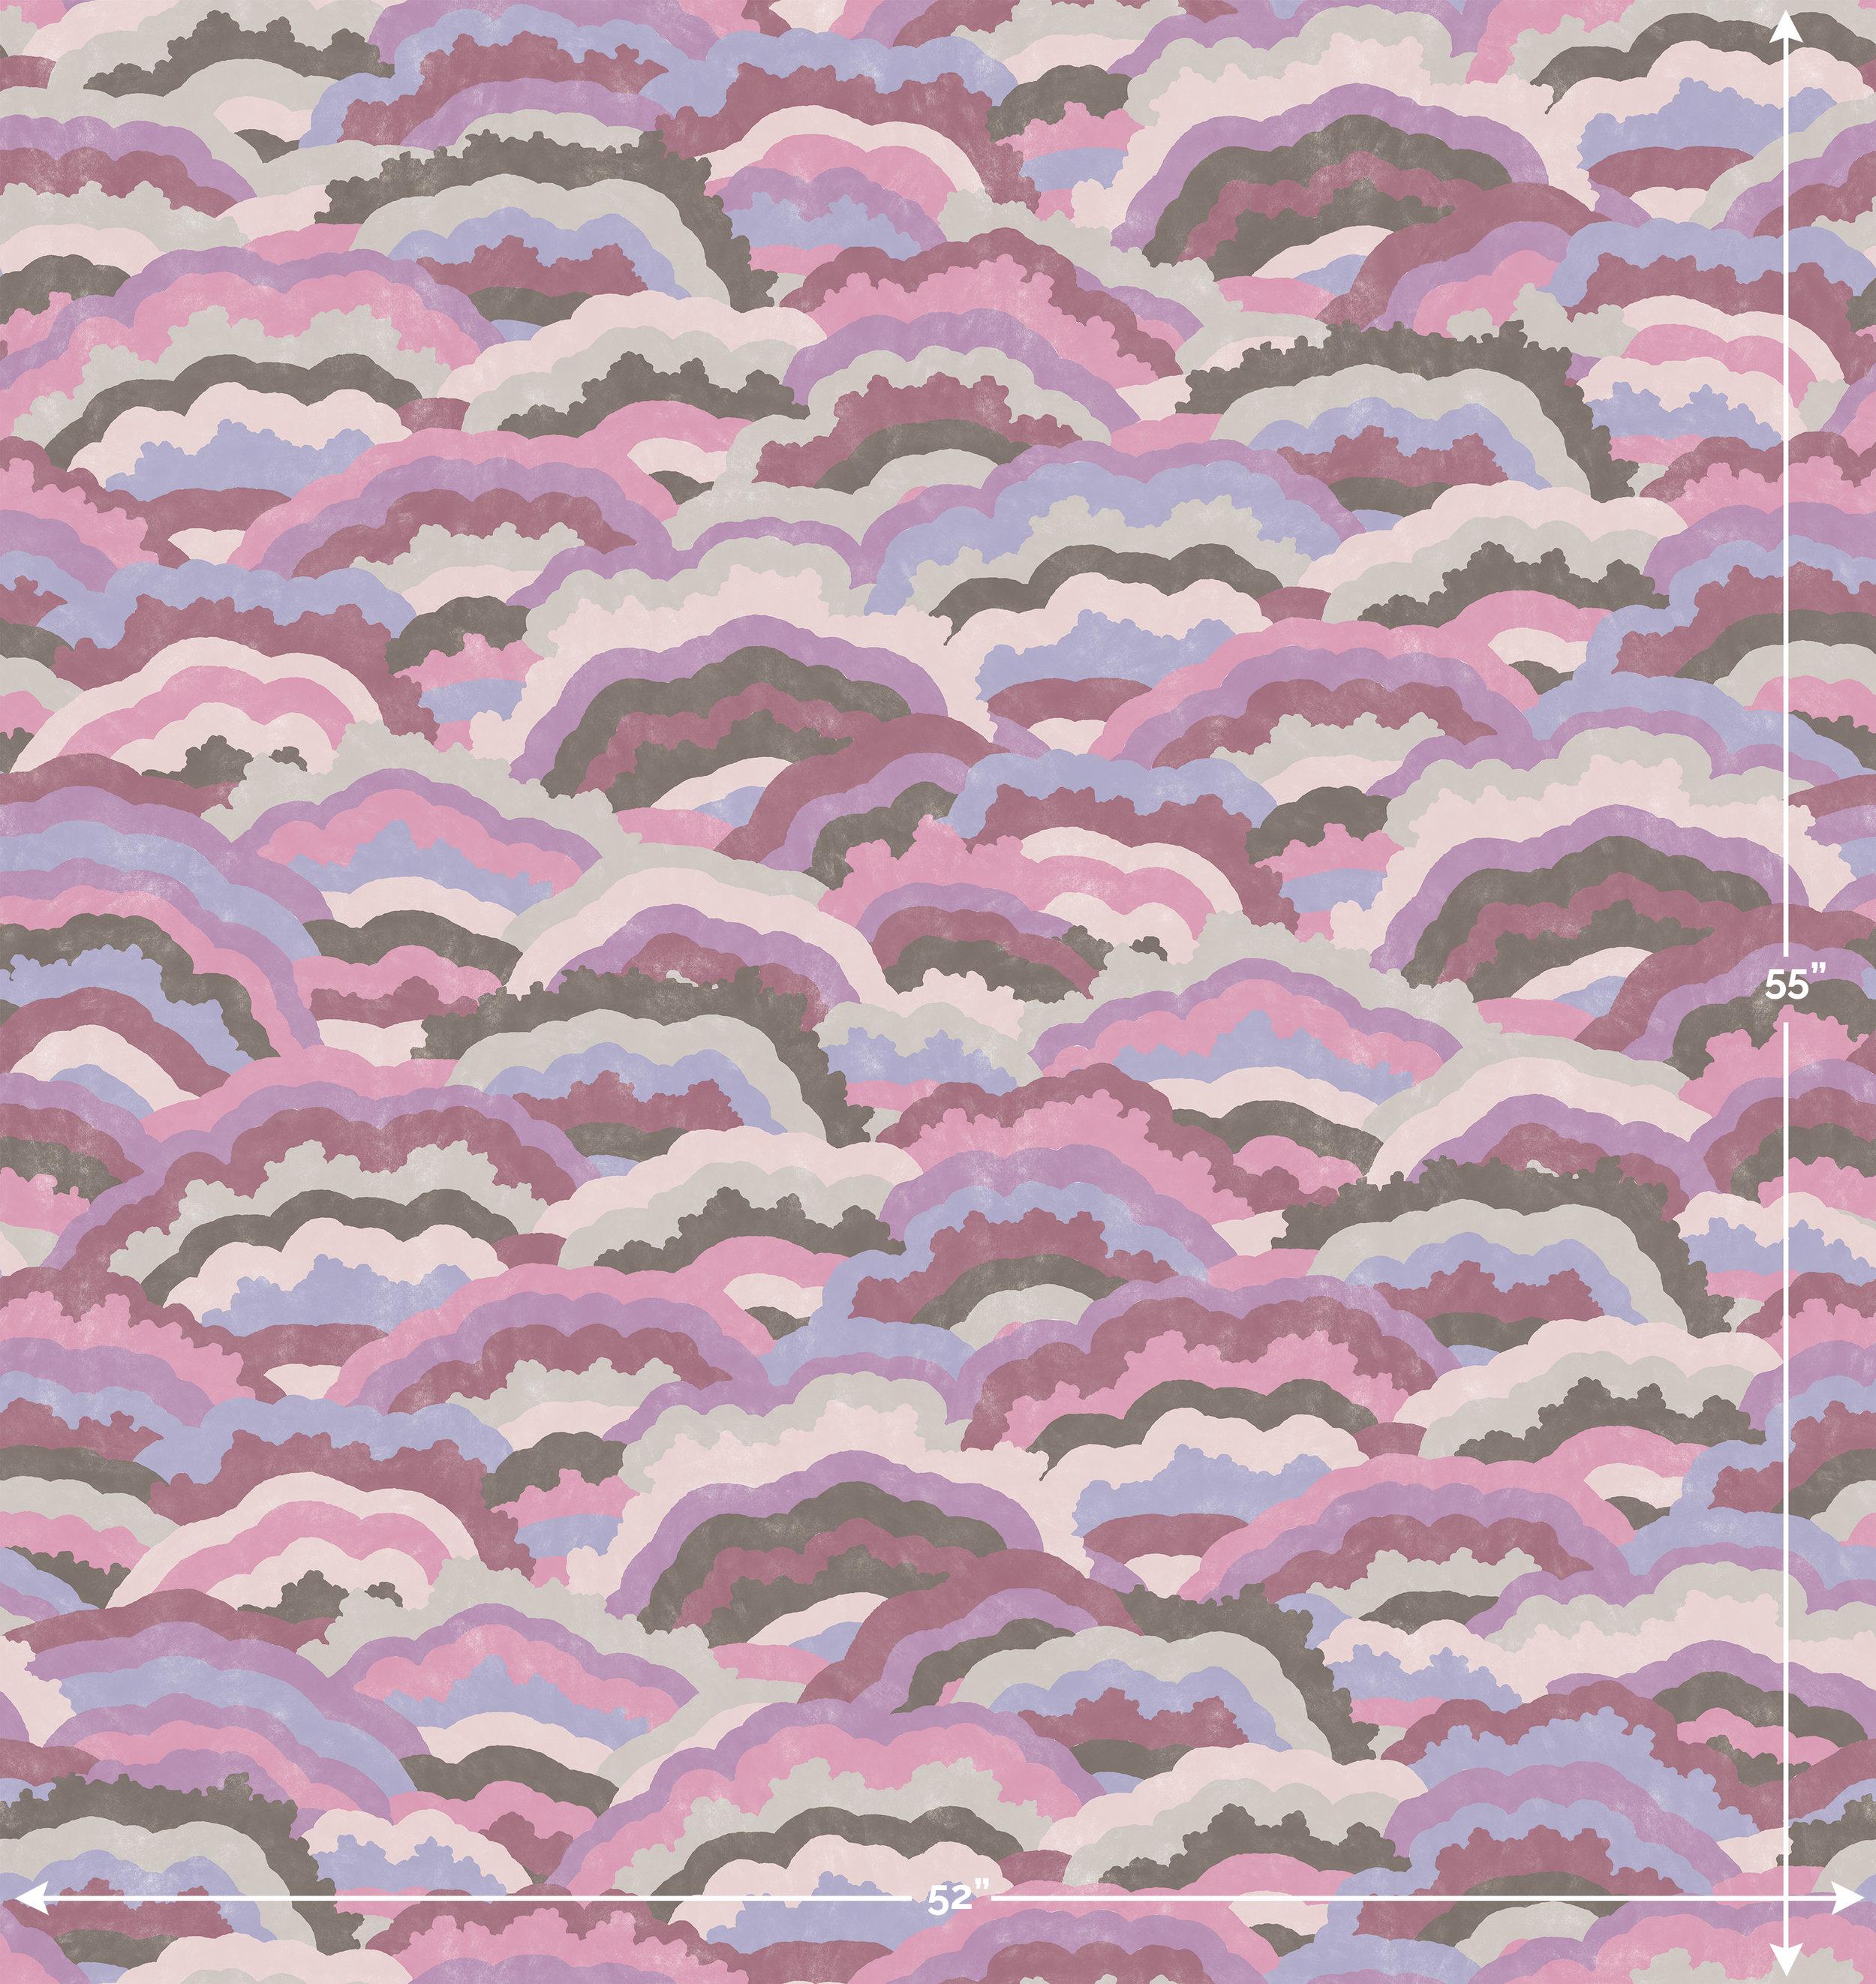 Dreamhouse_Colorway7.1_SML_WEB.jpg